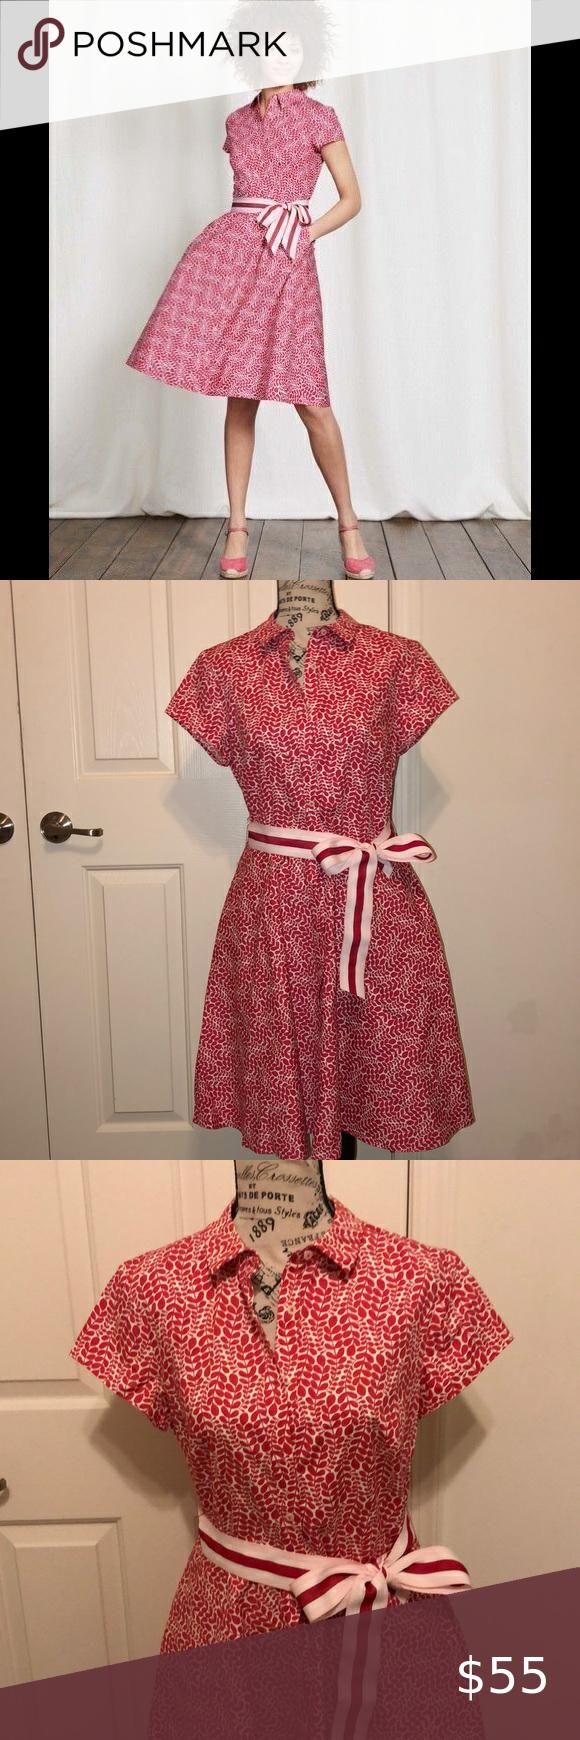 Boden Sophia Shirt Dress Belt Cotton Red